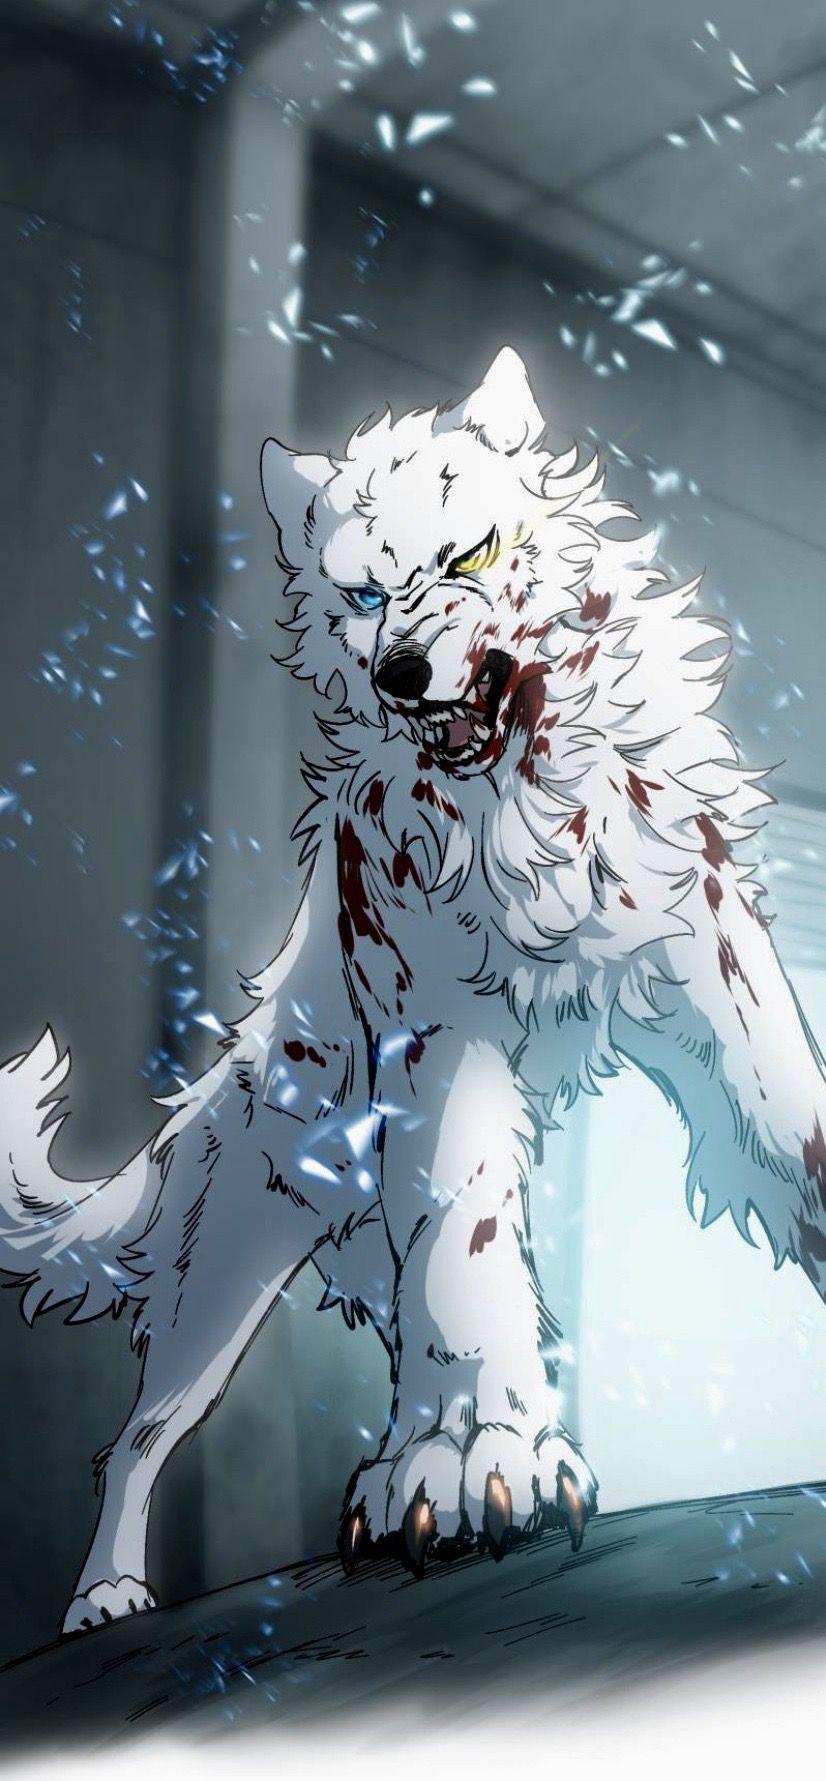 Lumine 4 in 2020 Anime art, Anime wolf, Anime